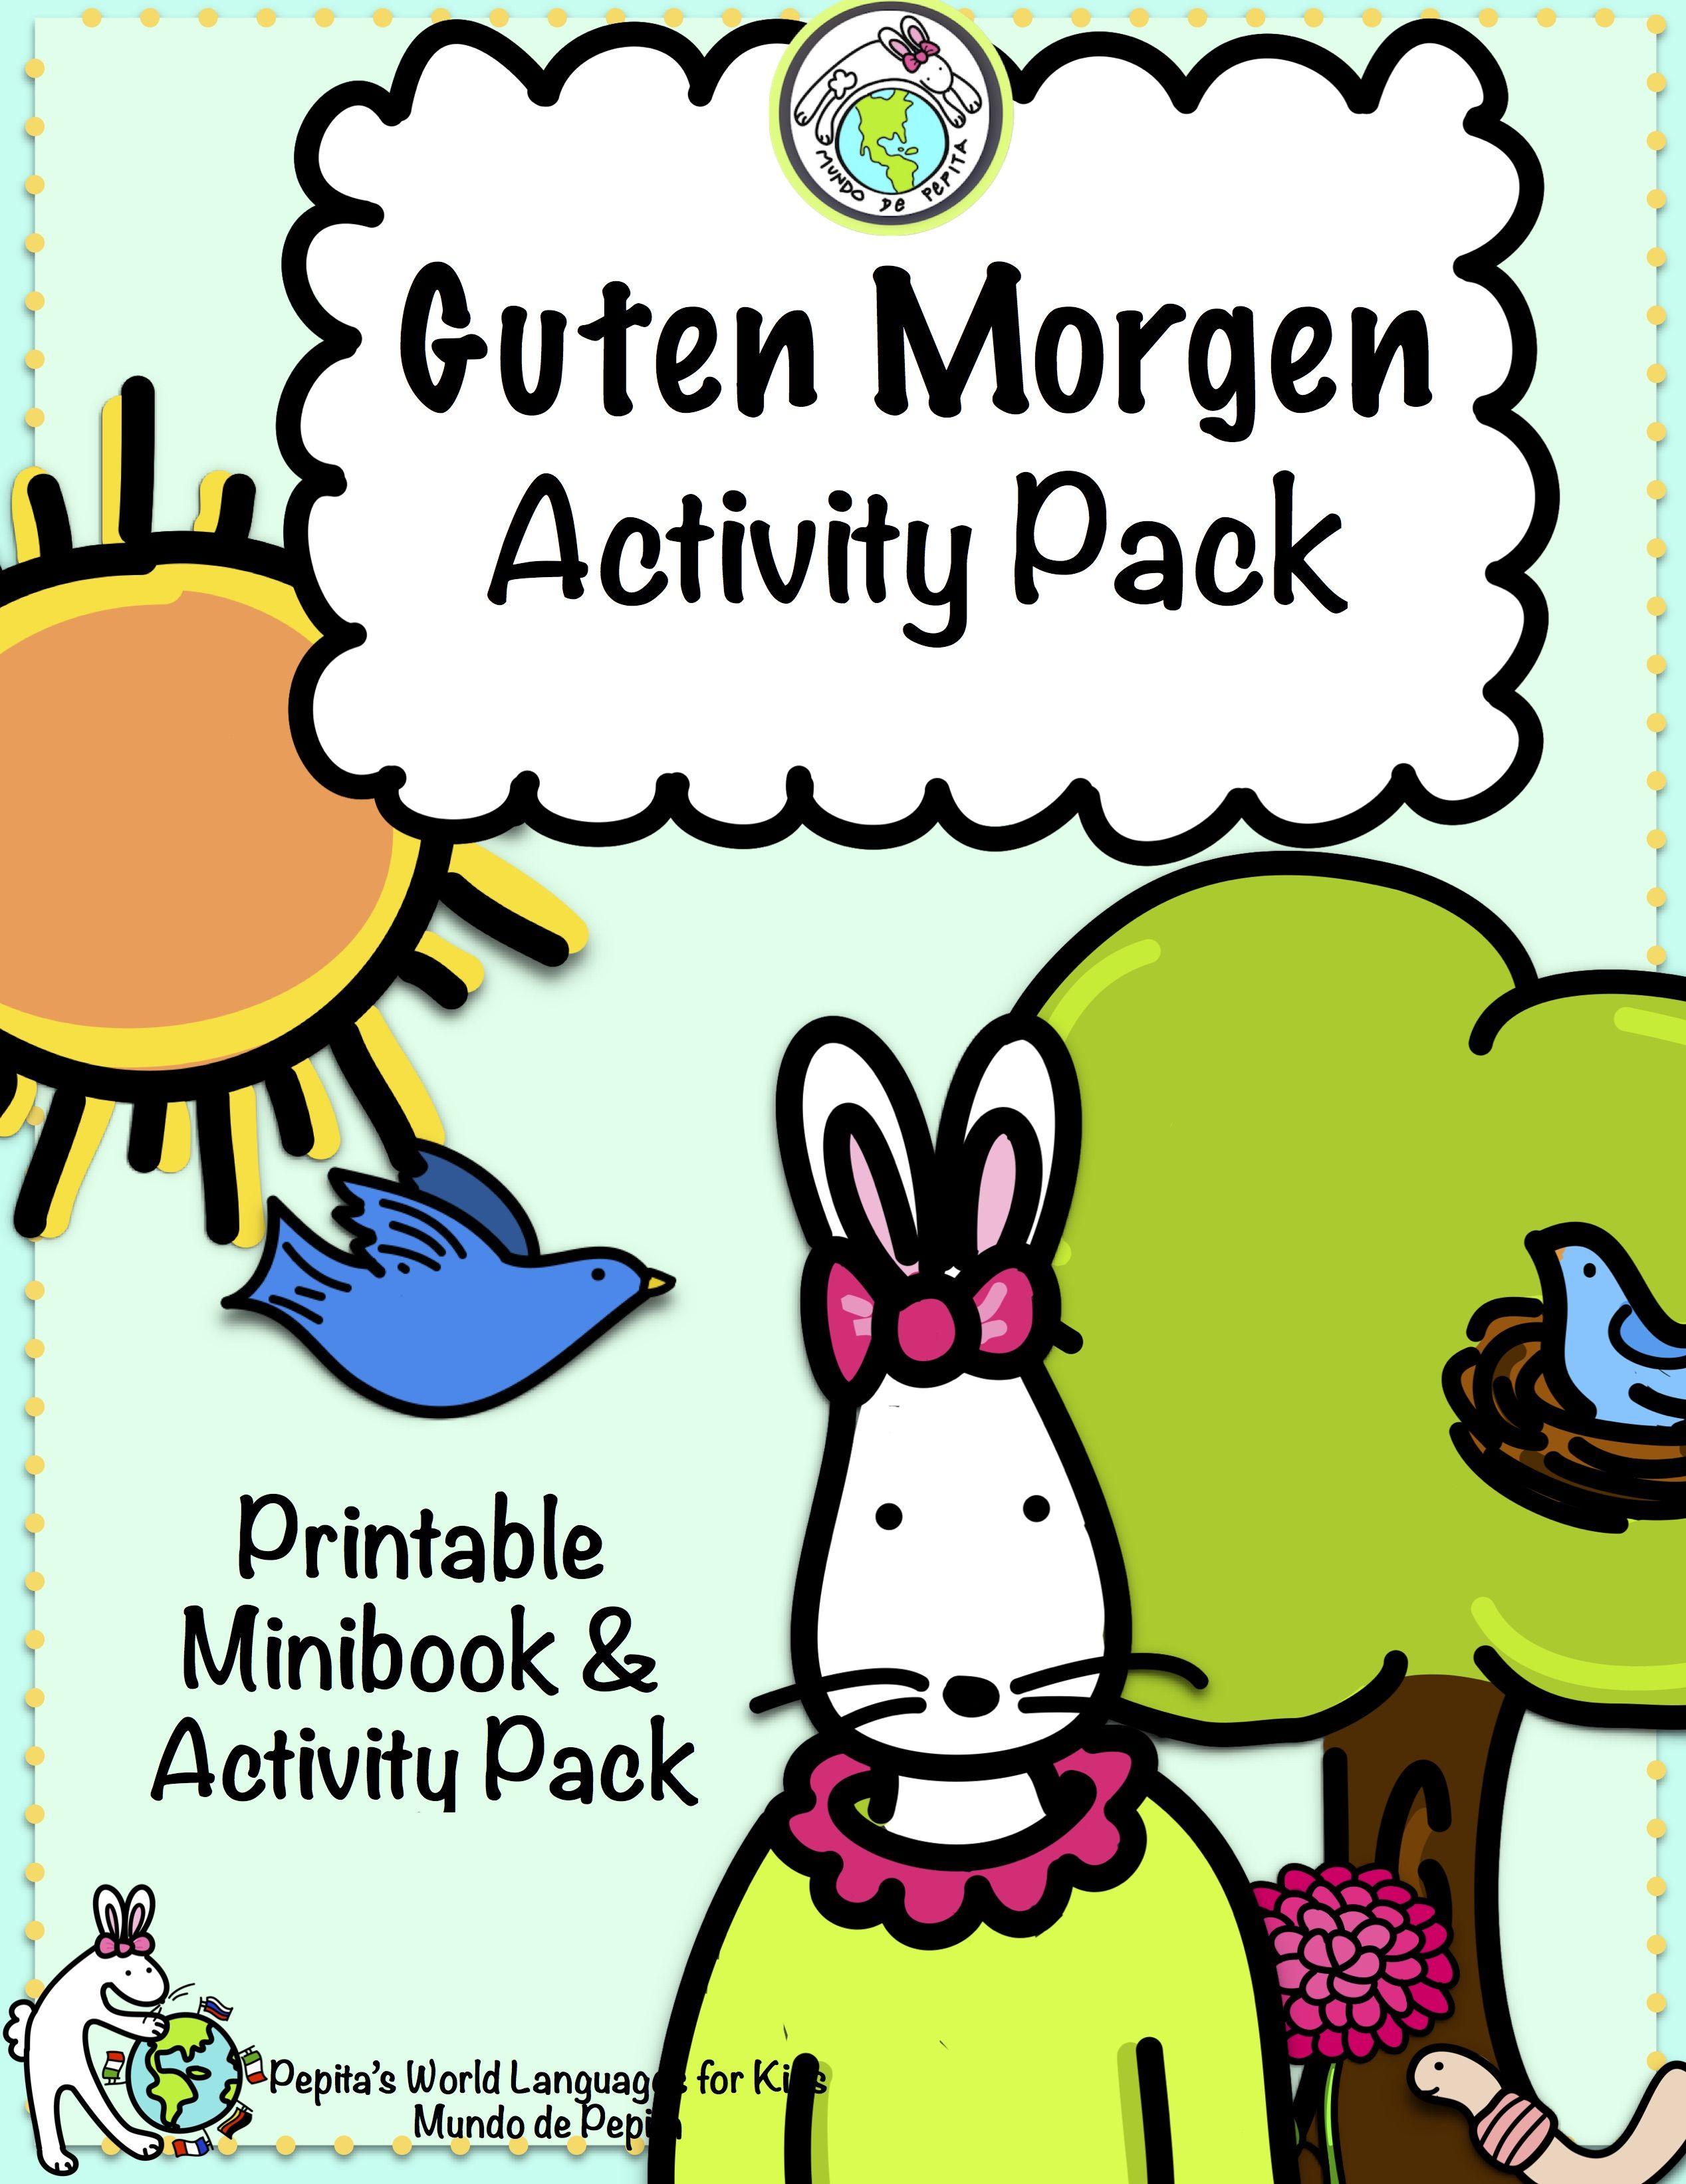 Guten Morgen Greetings Minibook And Activity Pack In German German